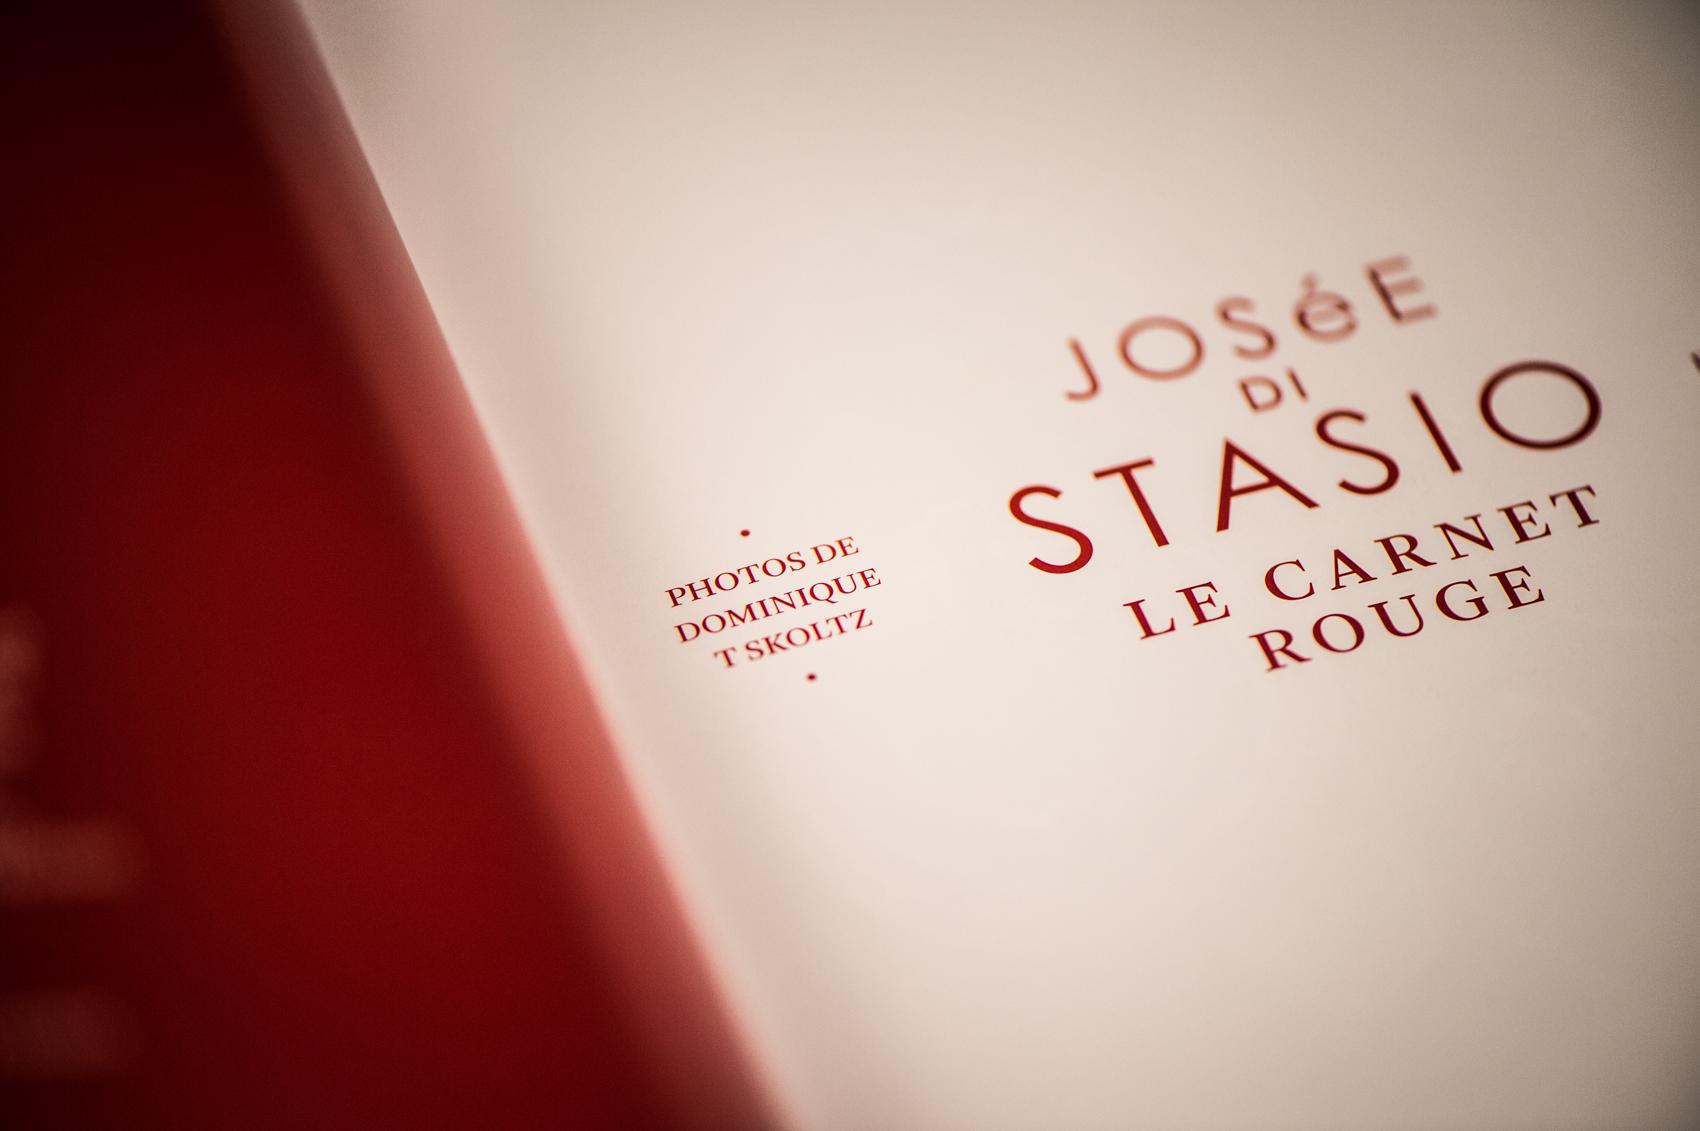 diStasio-rouge-17.jpg